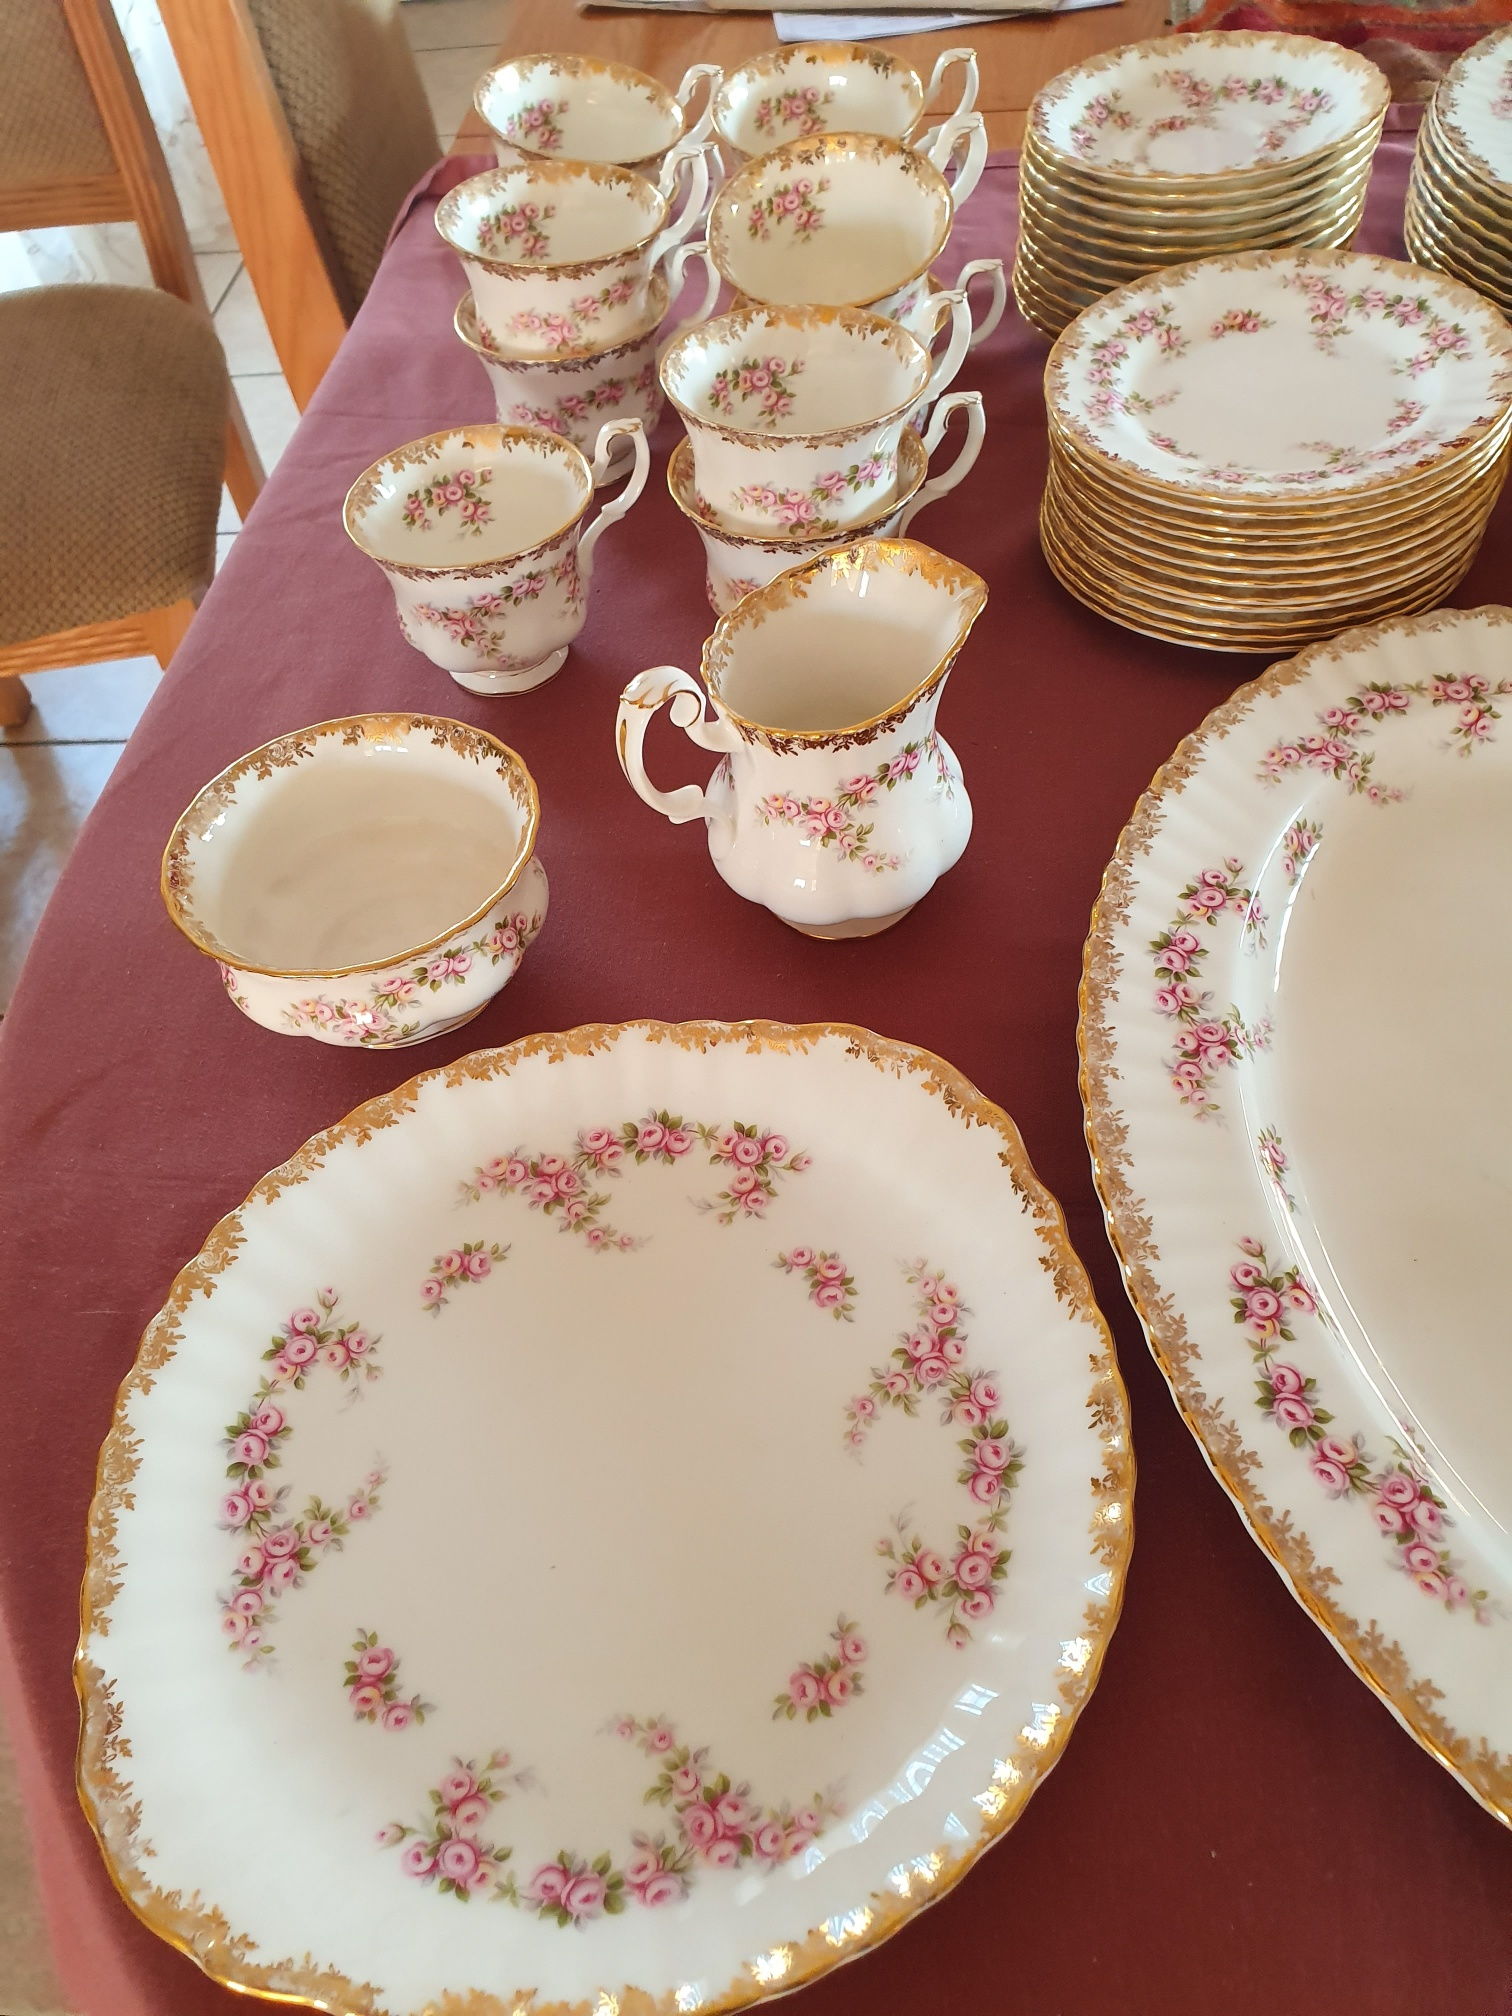 ROYAL ALBERT DIMITY ROSE PLATES,SAUCERS AND CUPS